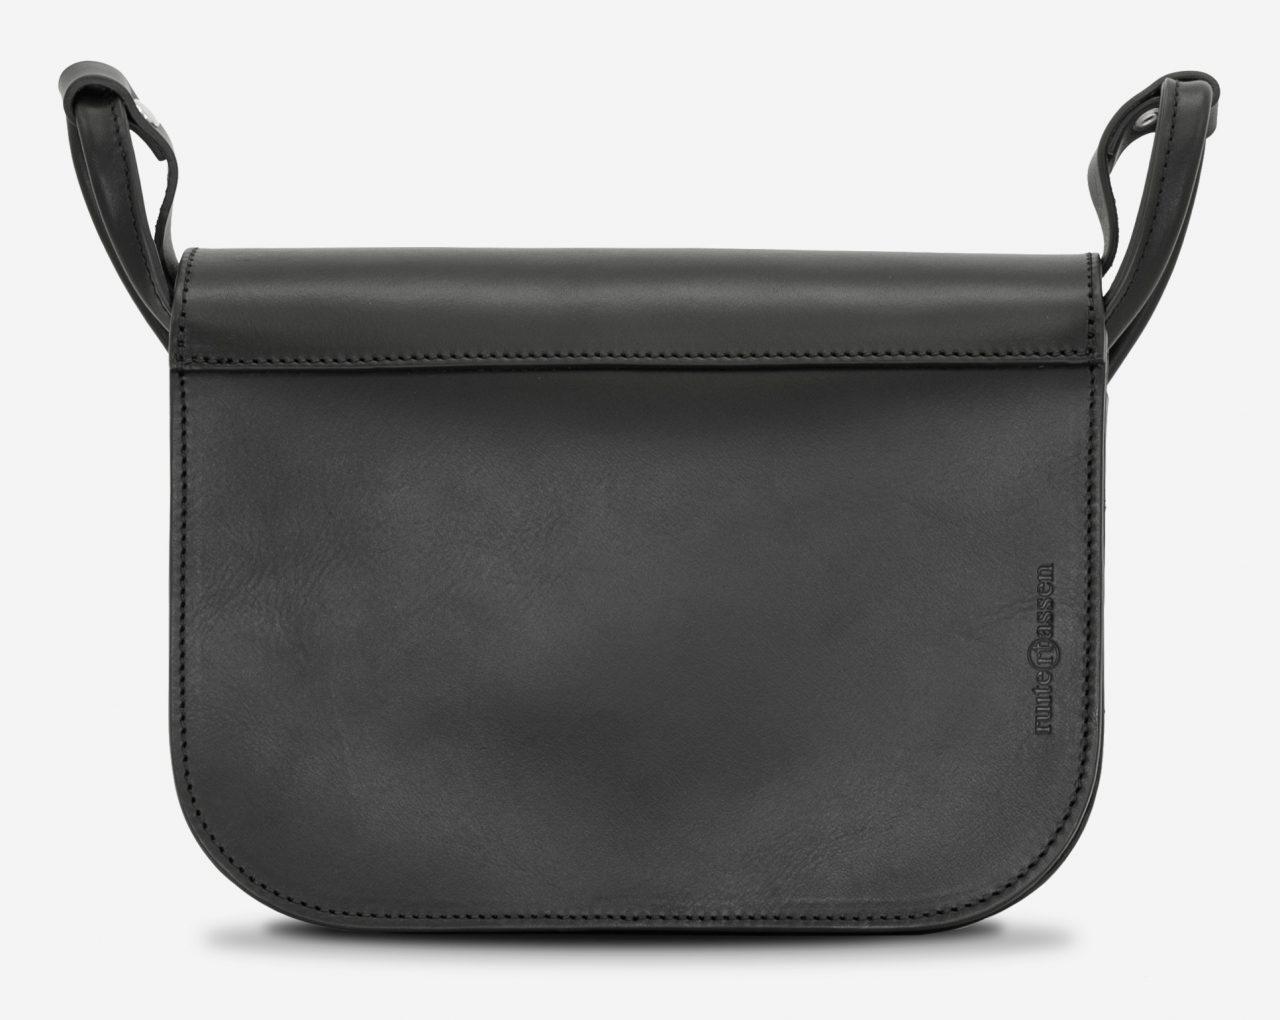 Back view of the large black leather shoulder bag for women.